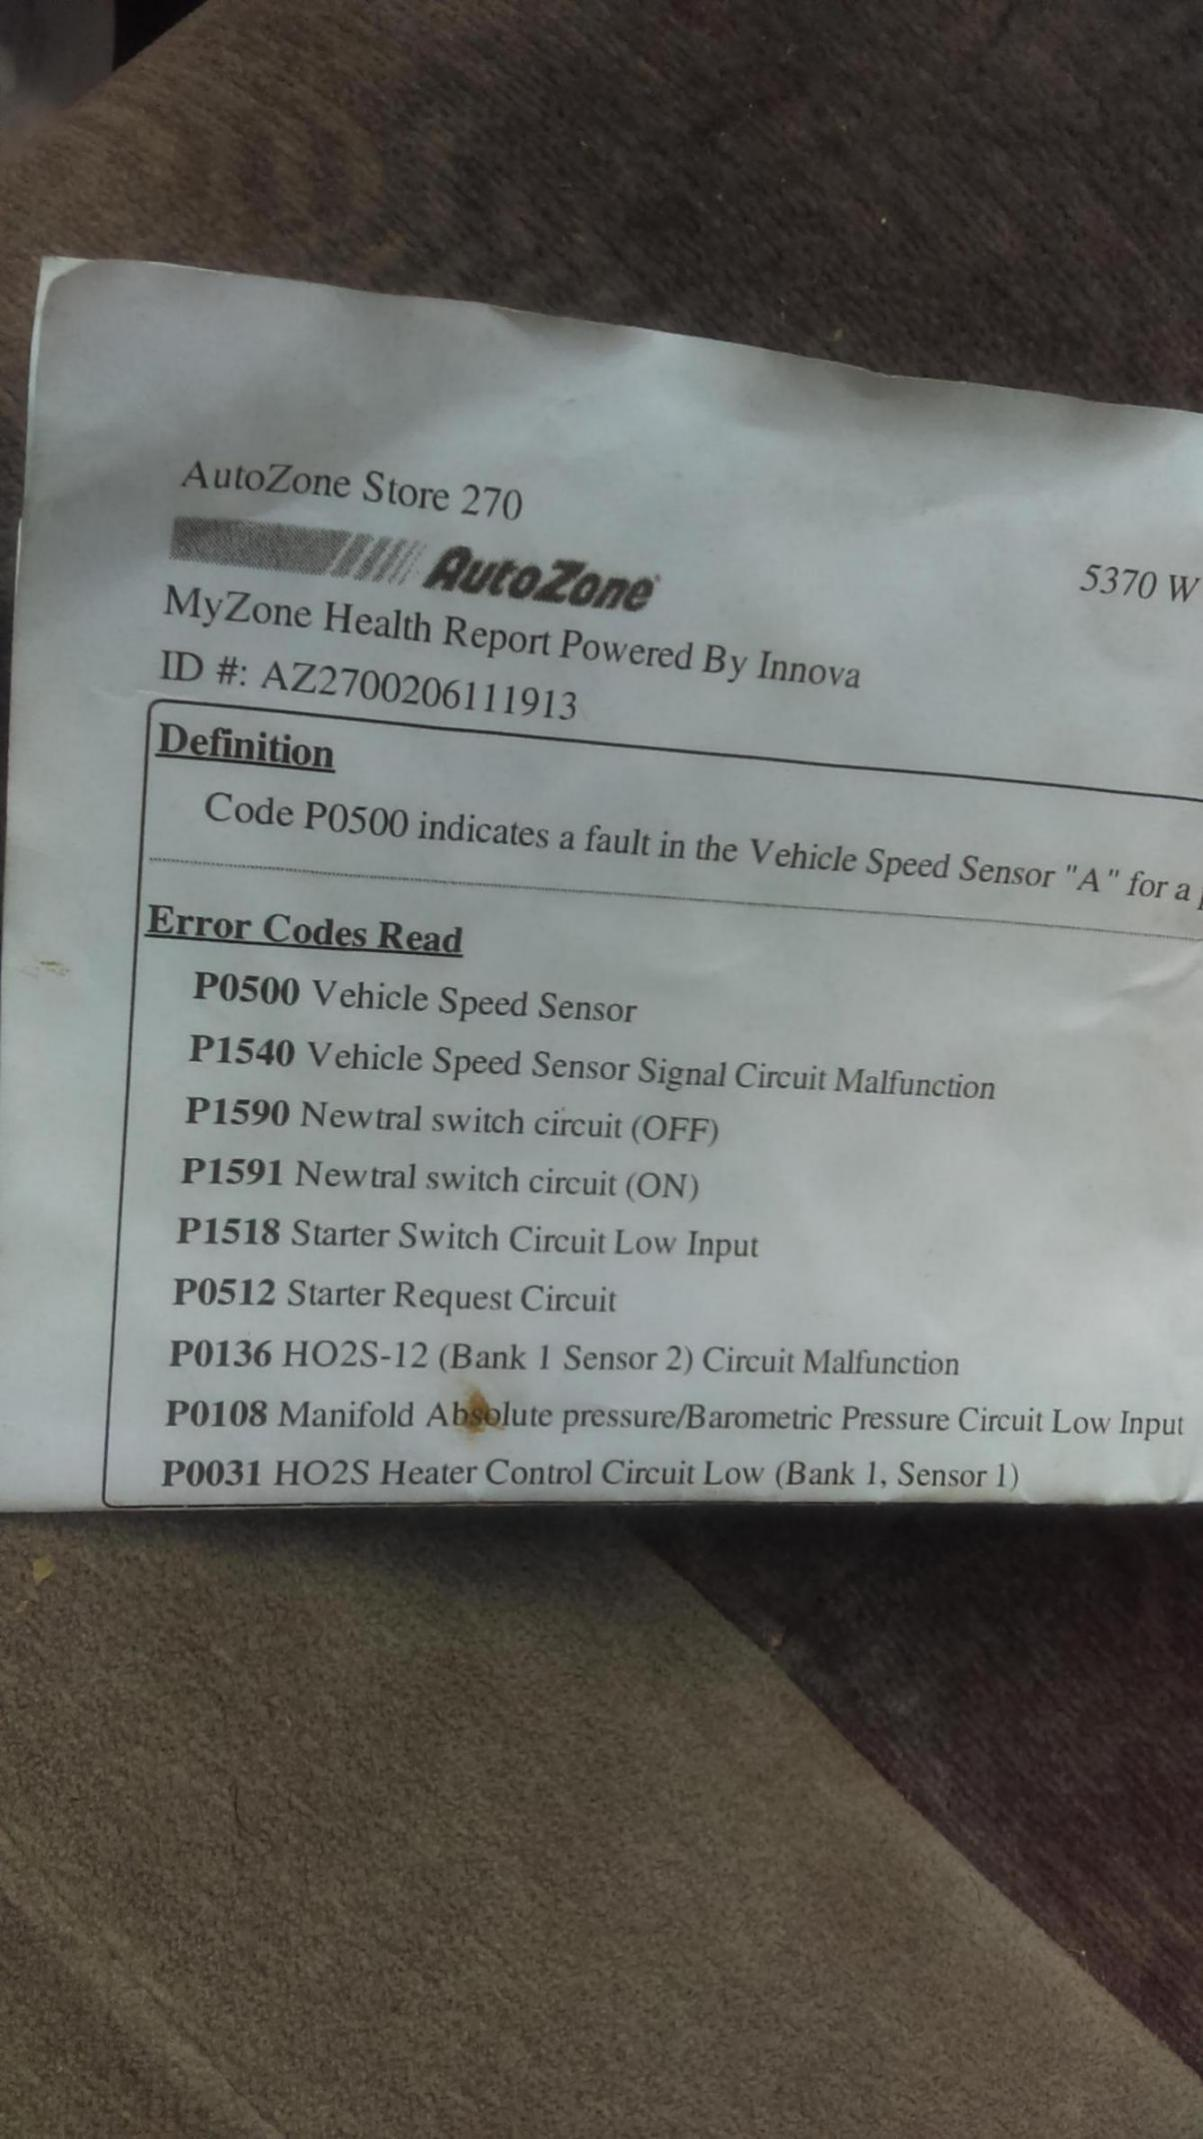 P0502 Vehicle Speed Sensor Issues, please help | Page 2 | Subaru